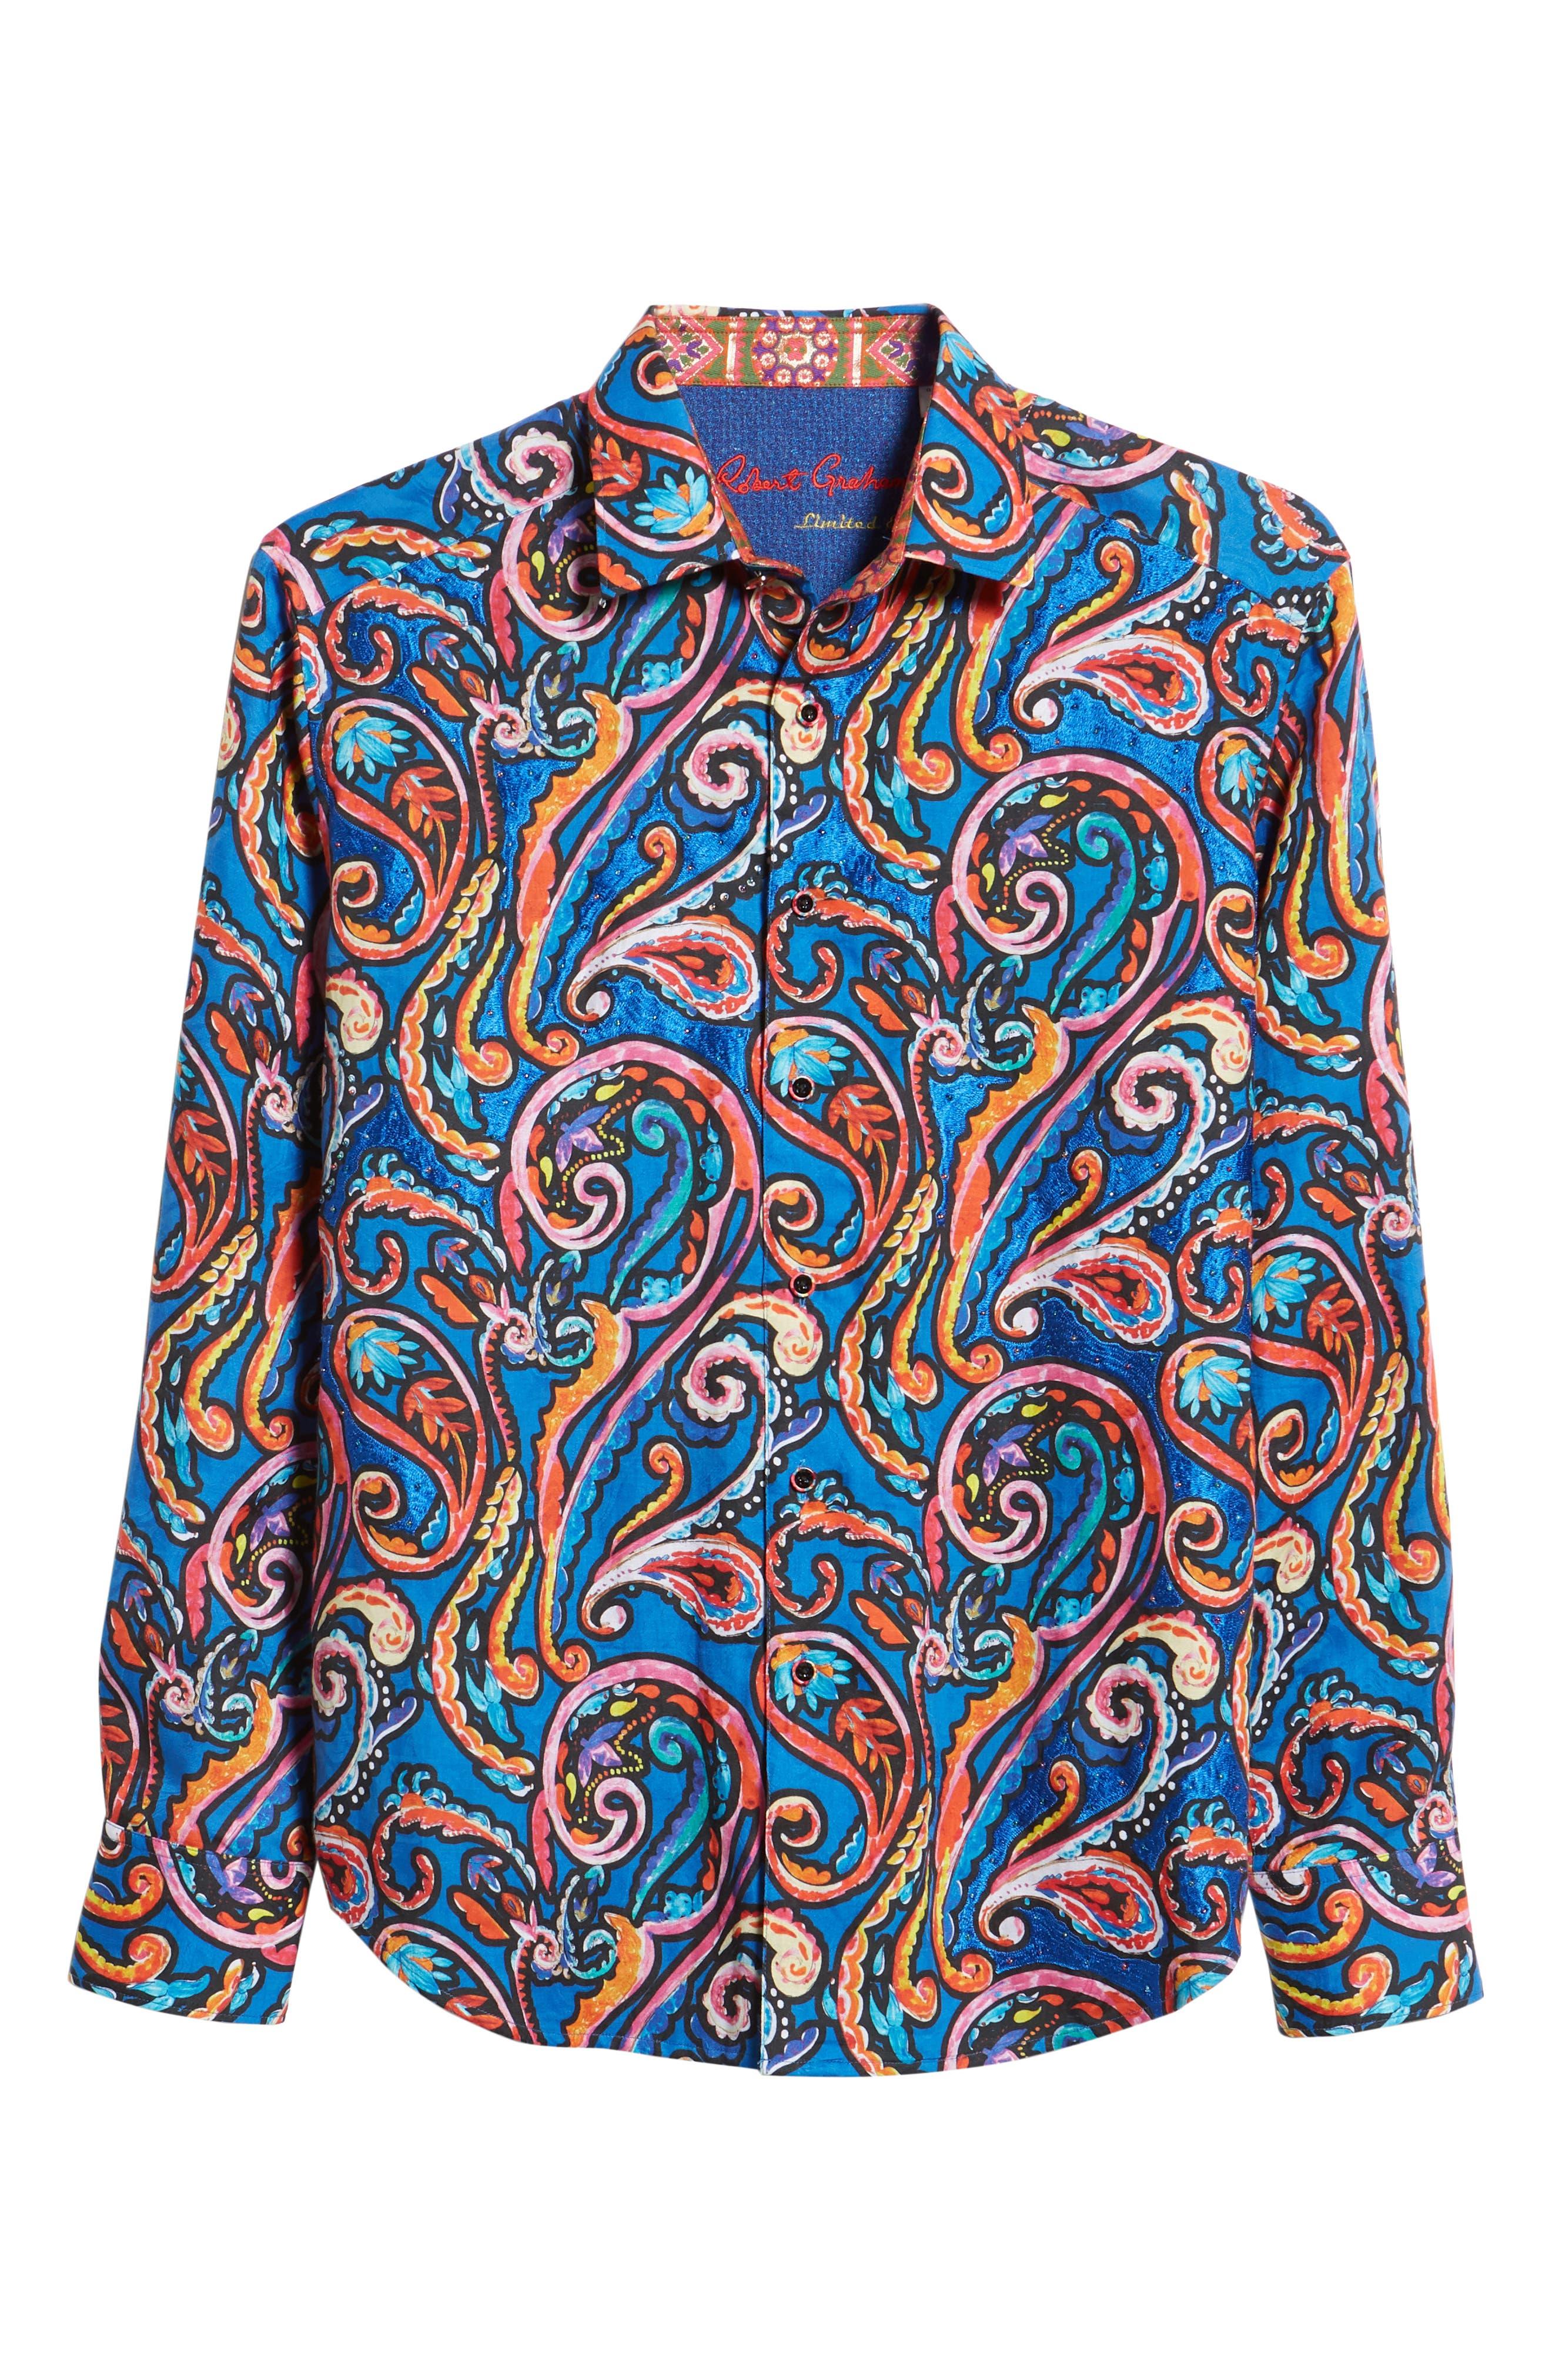 ROBERT GRAHAM,                             The Encourager Limited Edition Linen Blend Sport Shirt,                             Alternate thumbnail 5, color,                             400